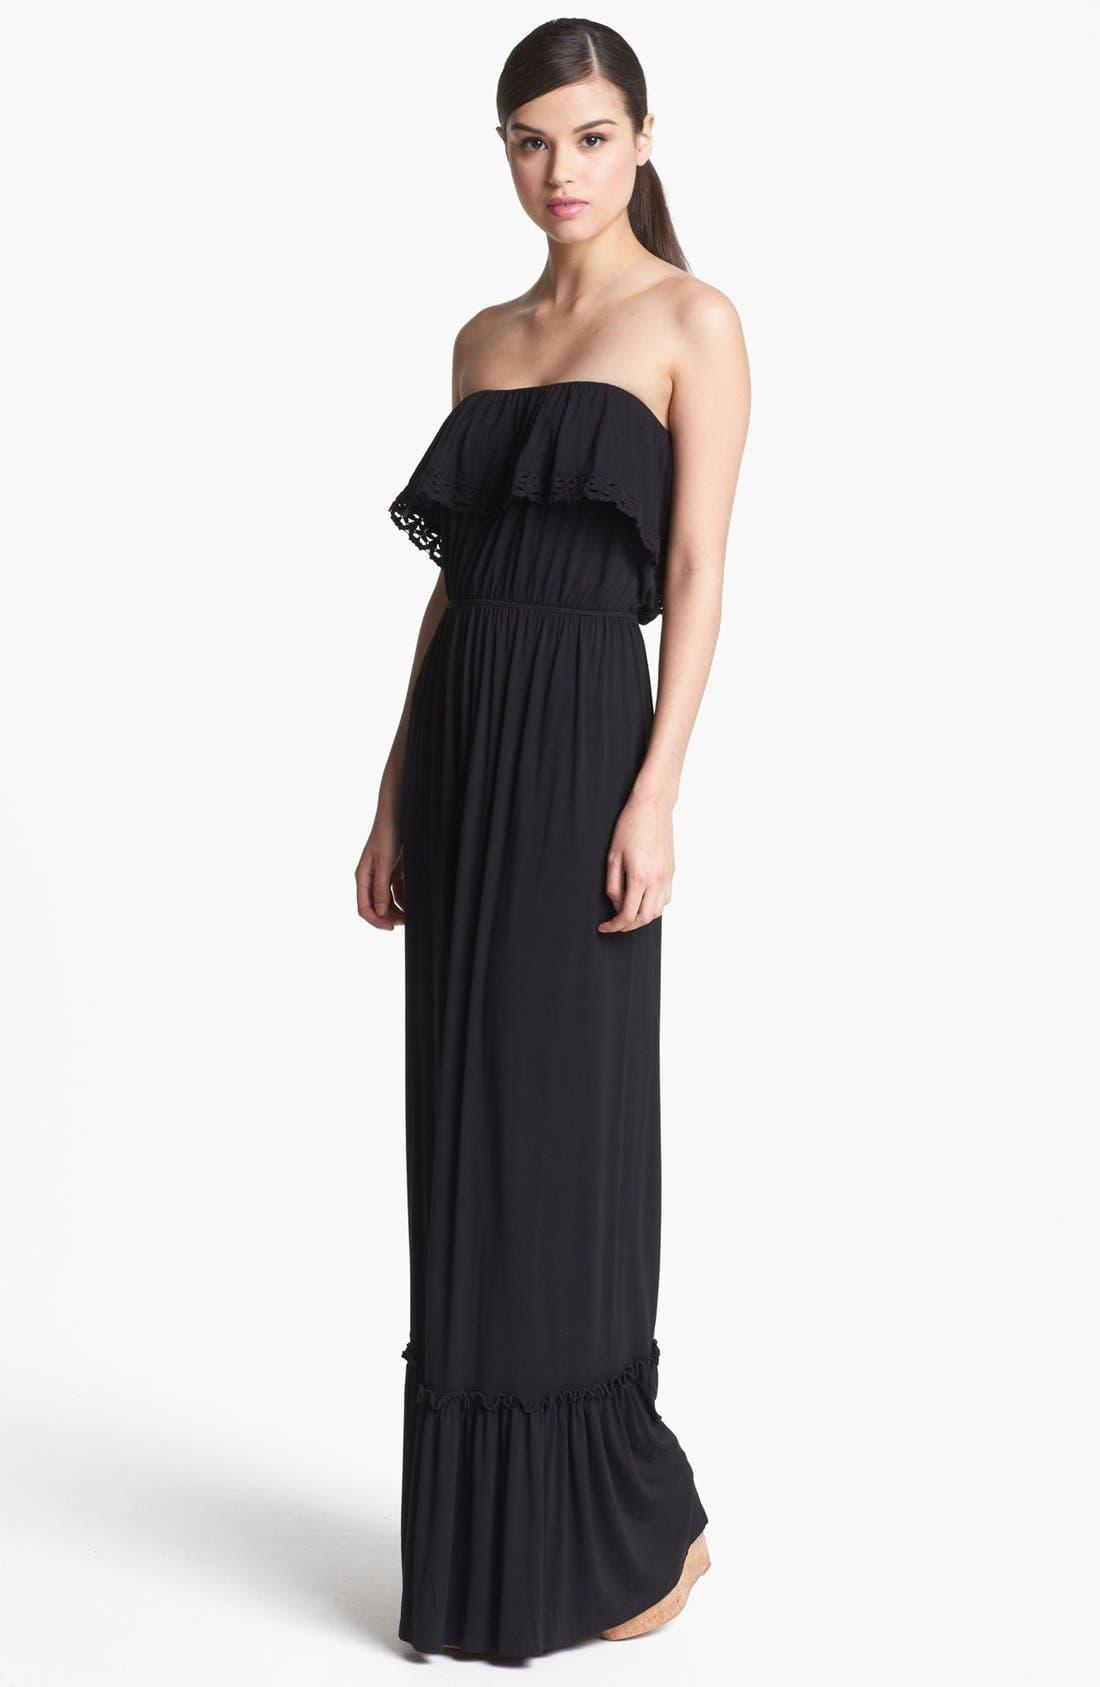 Ruffled Strapless Maxi Dress,                             Main thumbnail 1, color,                             001